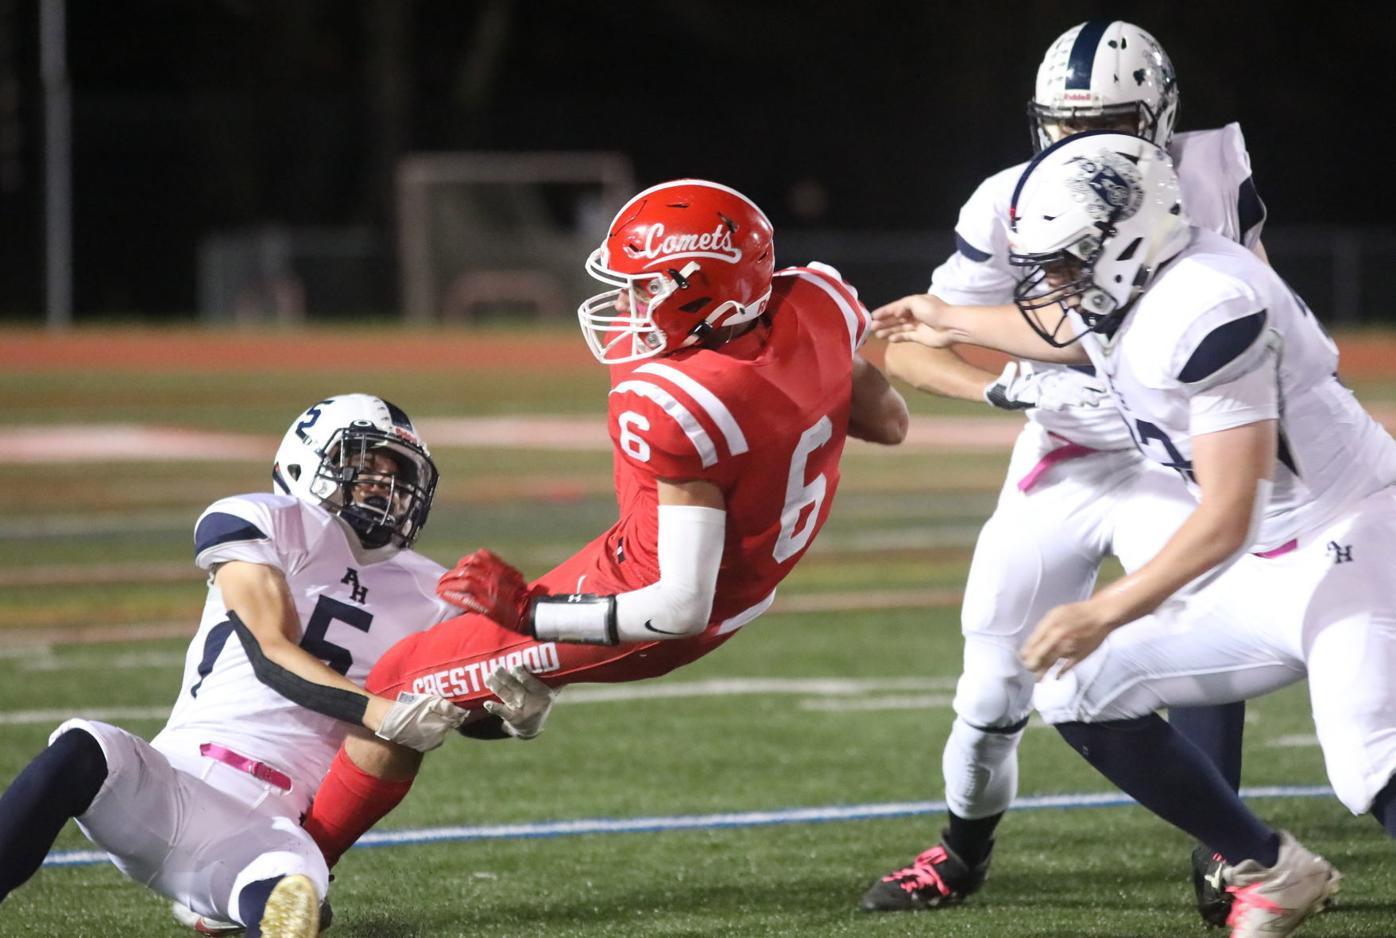 HS FOOTBALL: Schultz, Crestwood run past Abington Heights